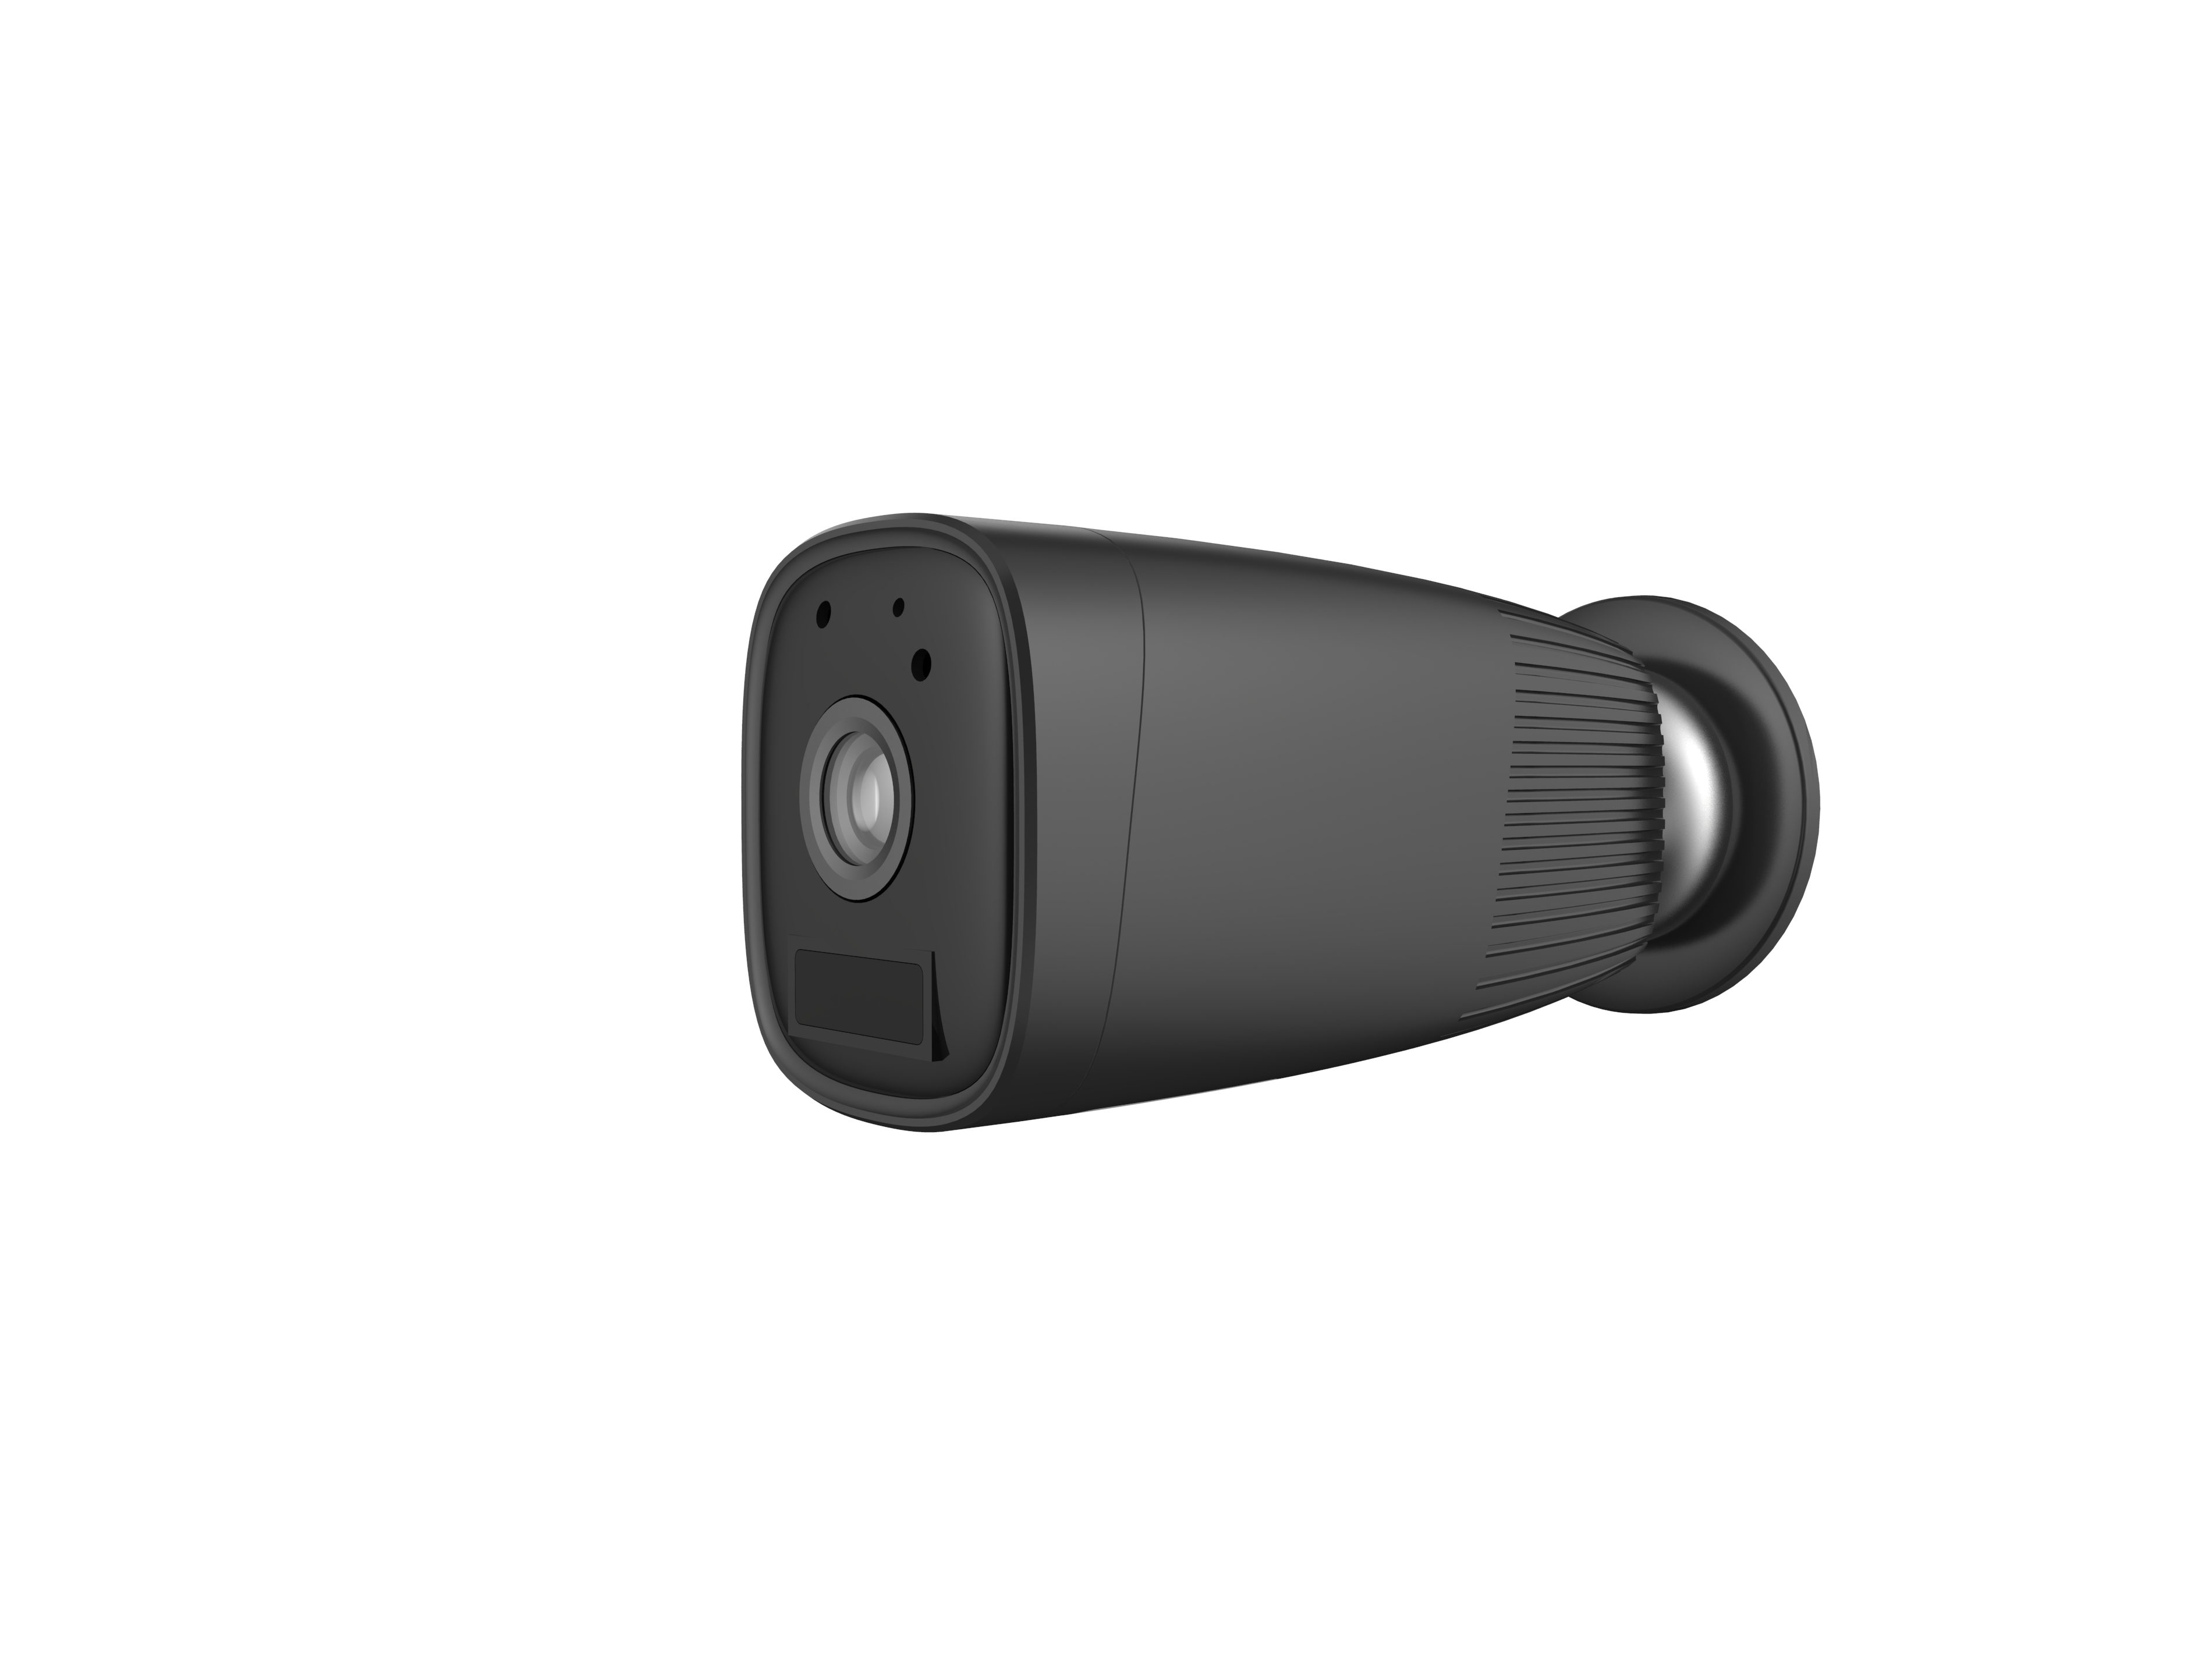 Built in 4pcs original Panasonic 18650 long lasting 2MP Wireless IP bullet cameras P2P wifi Recharge black IP security cameras